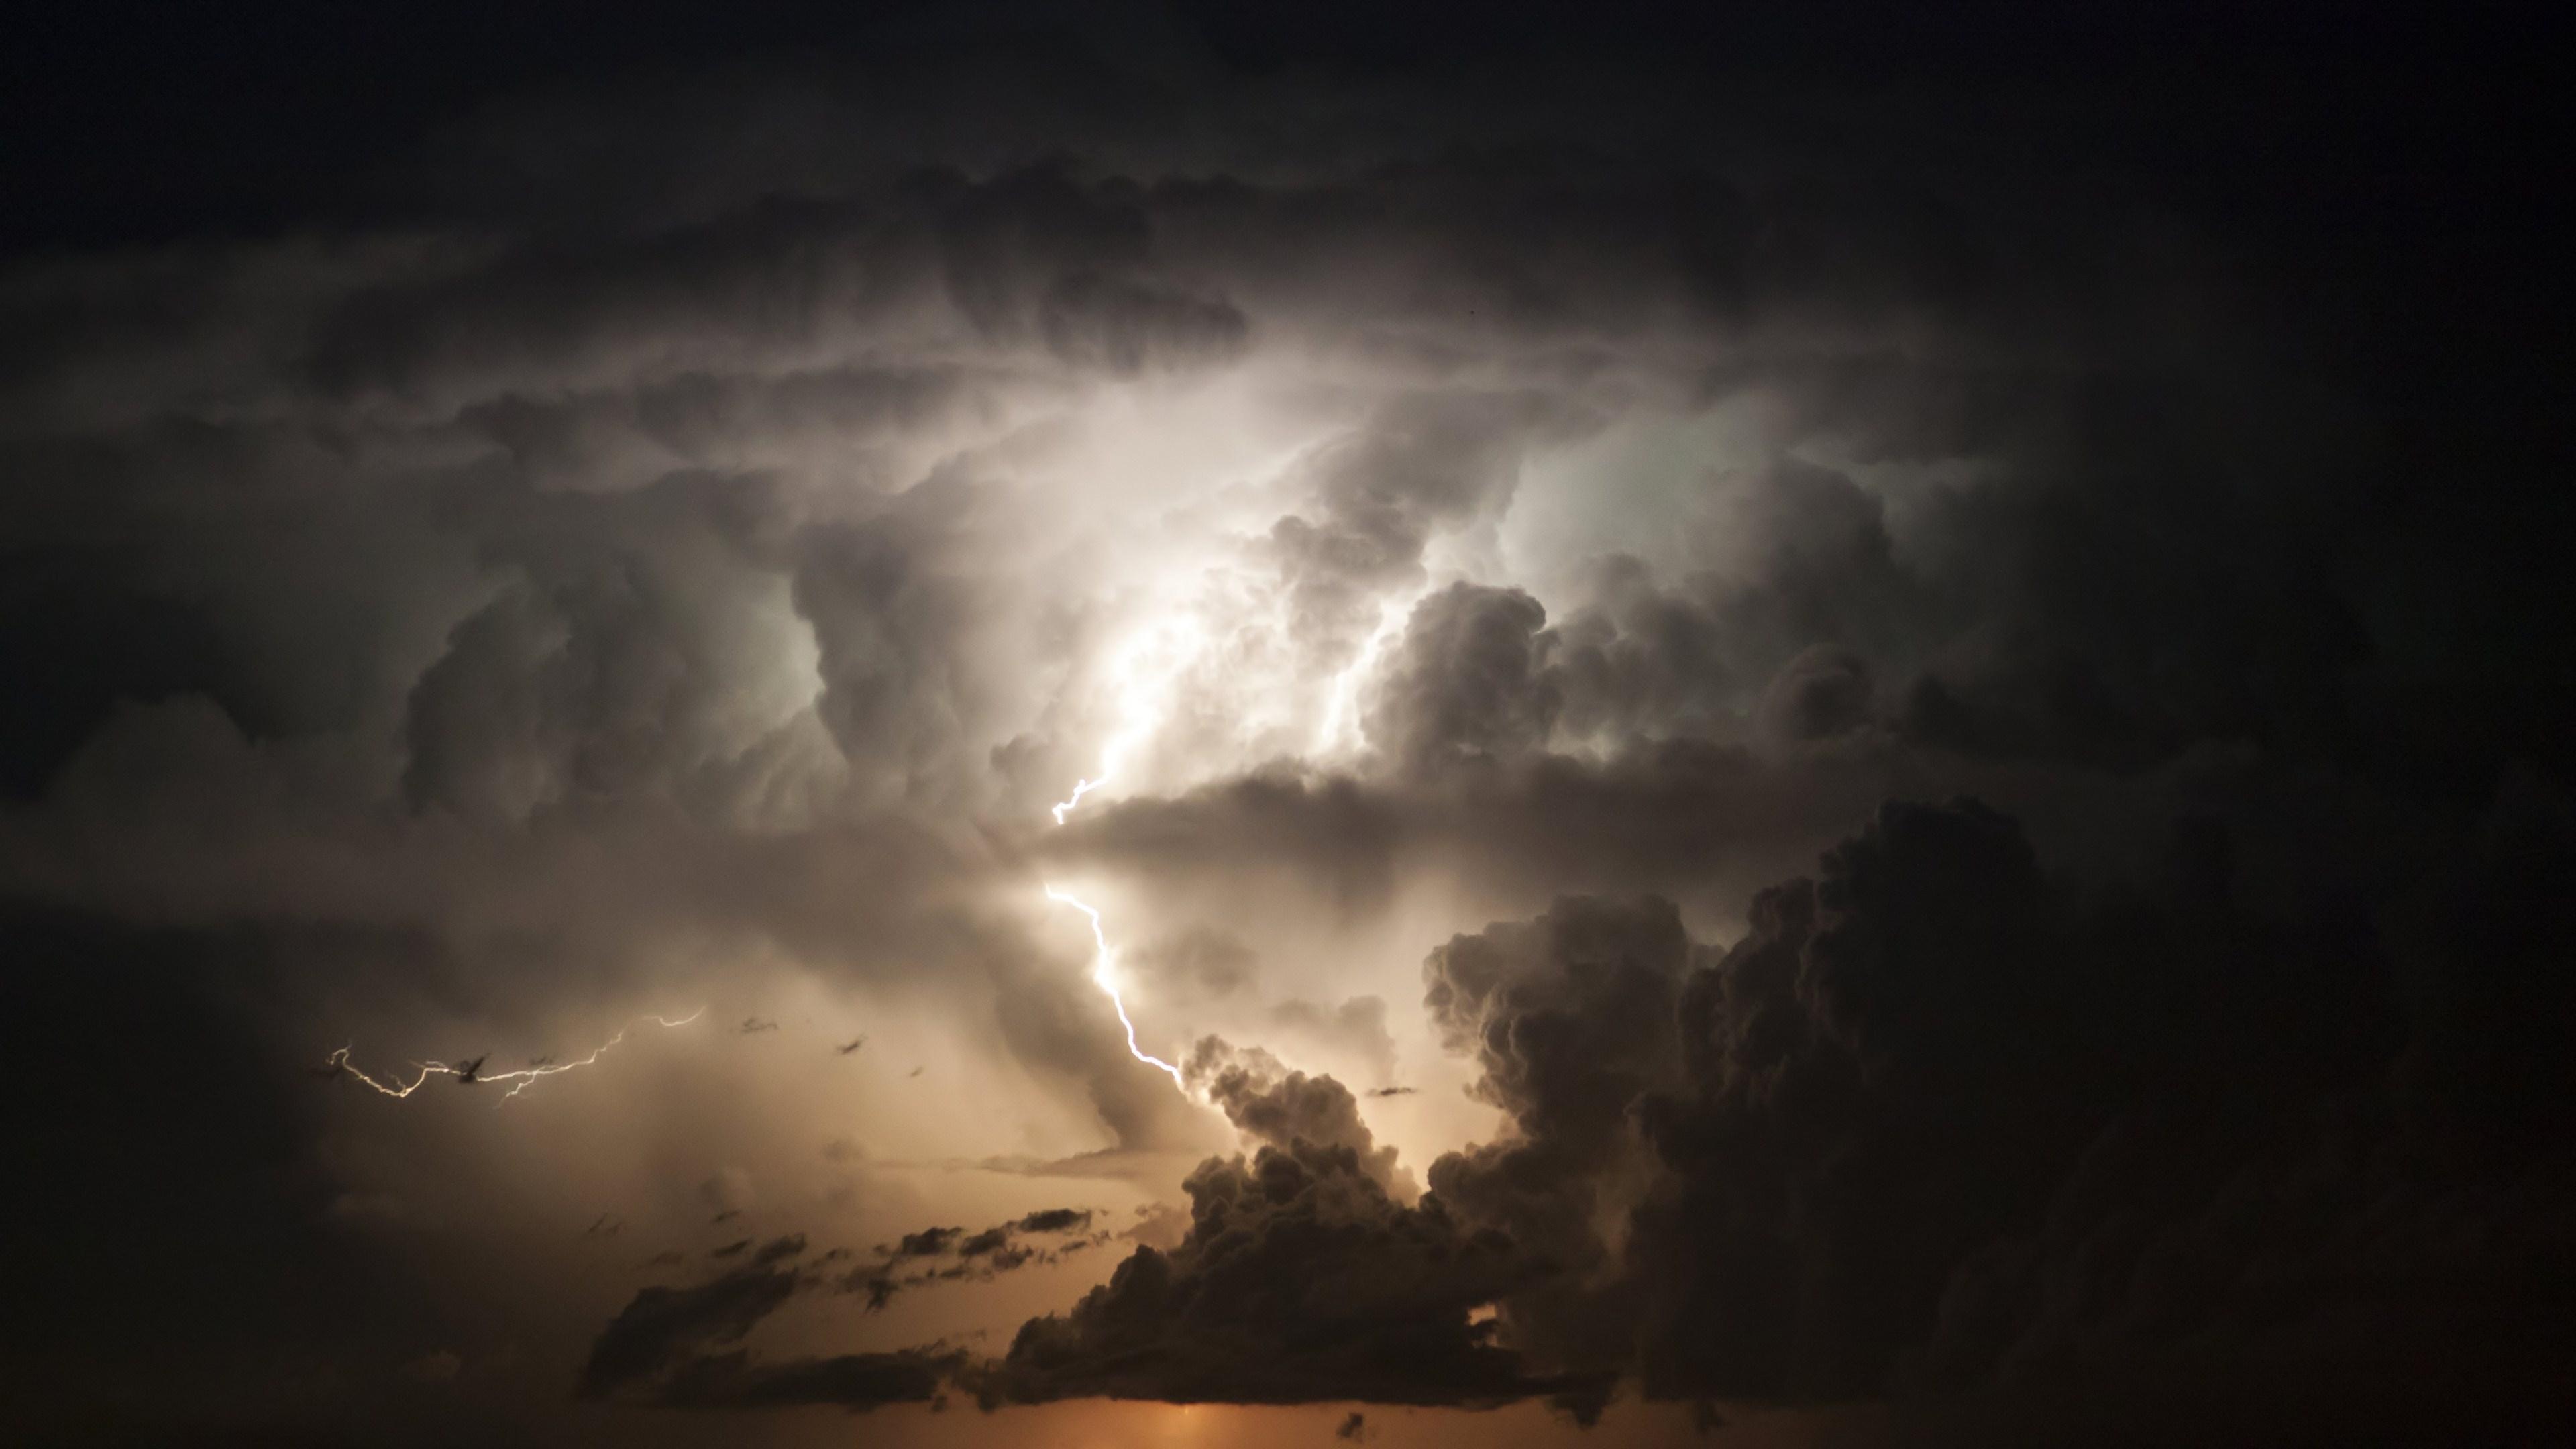 White Clouds In The Sky 4k Hd Desktop Wallpaper For 4k: Lightning 4k Ultra HD Wallpaper